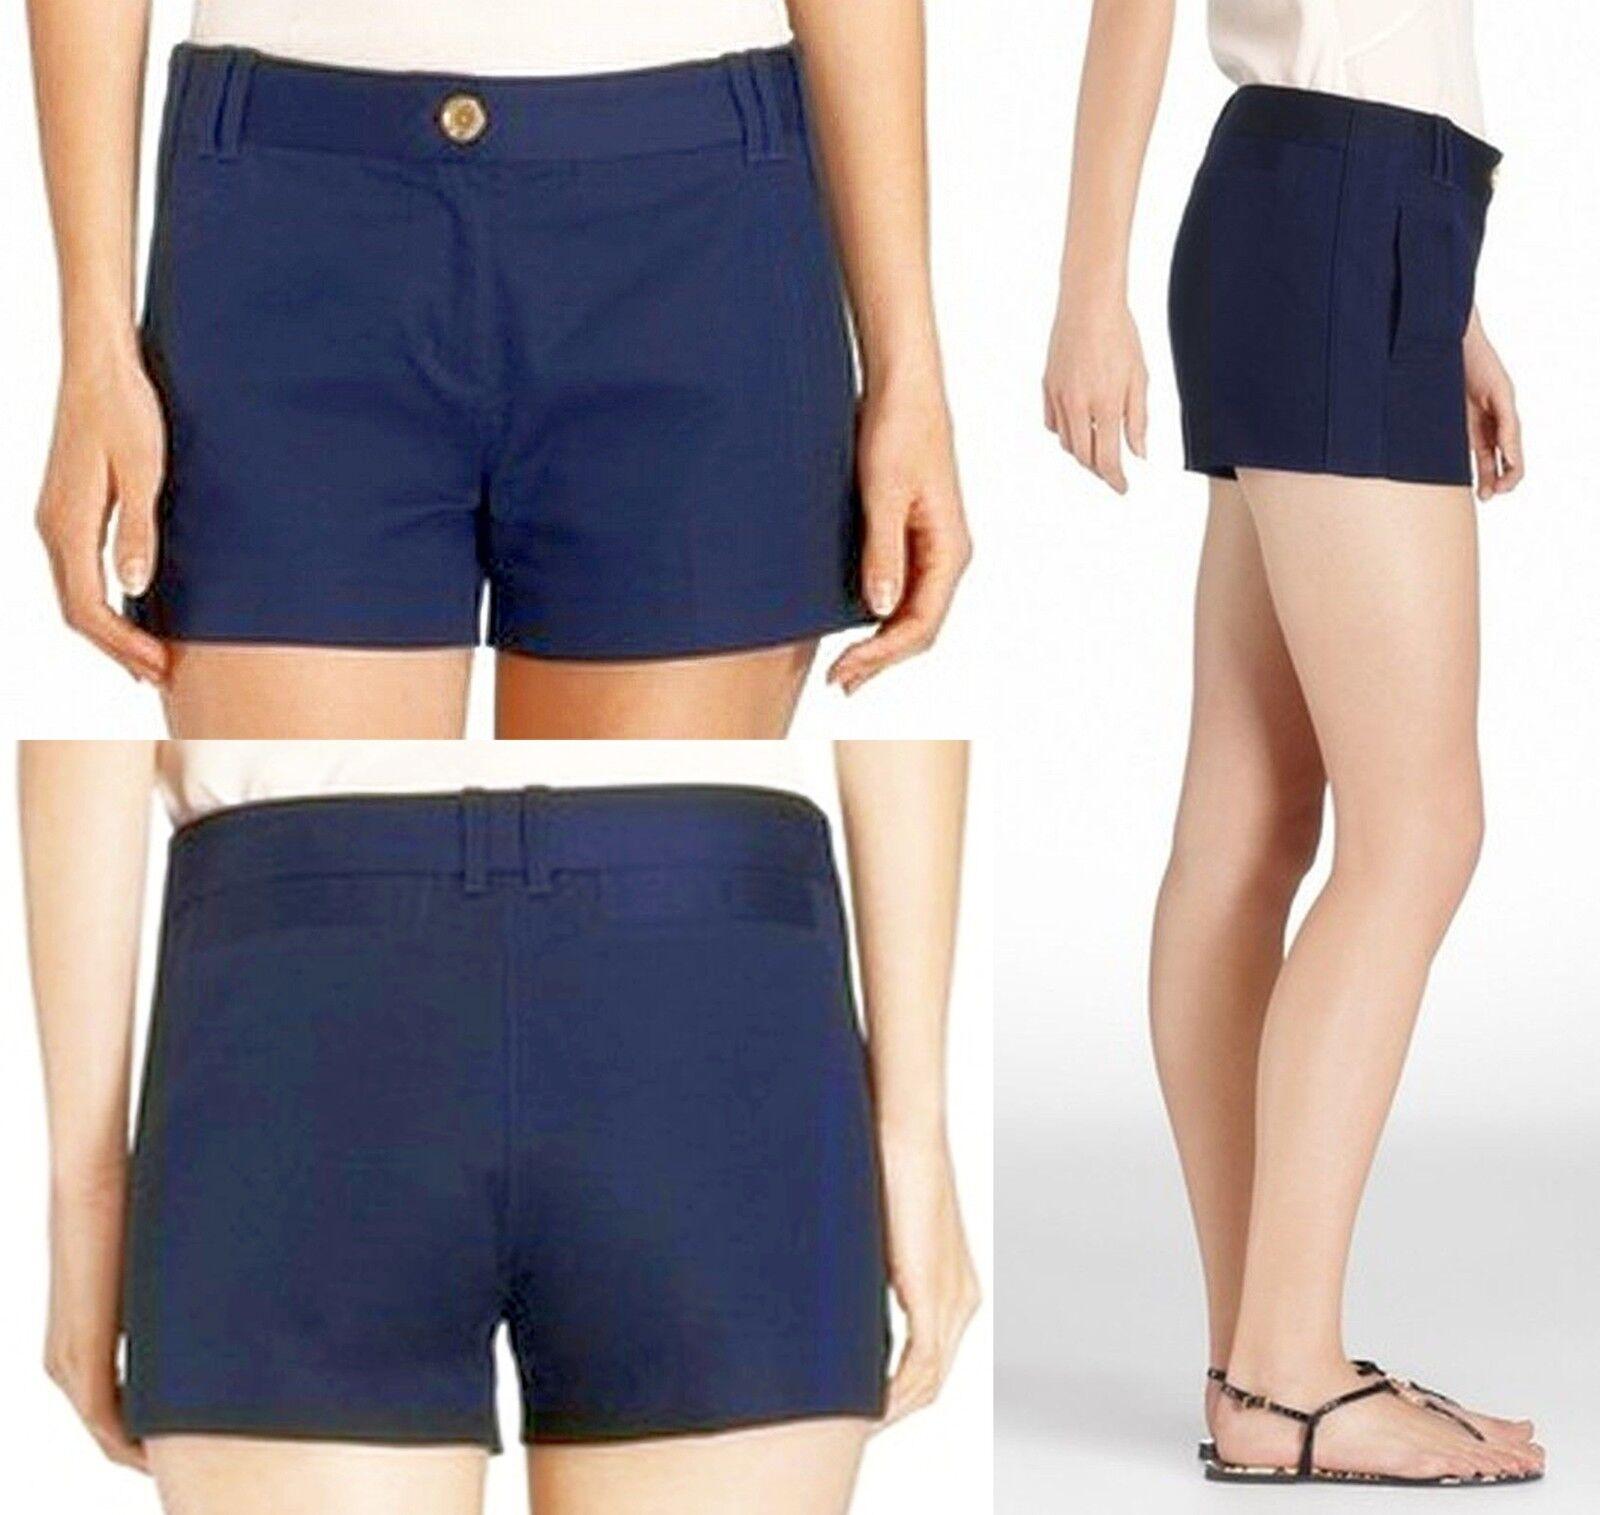 Tory Burch Ollie Shorts sz 12 Cotton Women Lady SEXY Pants Holiday Gift NEW USA